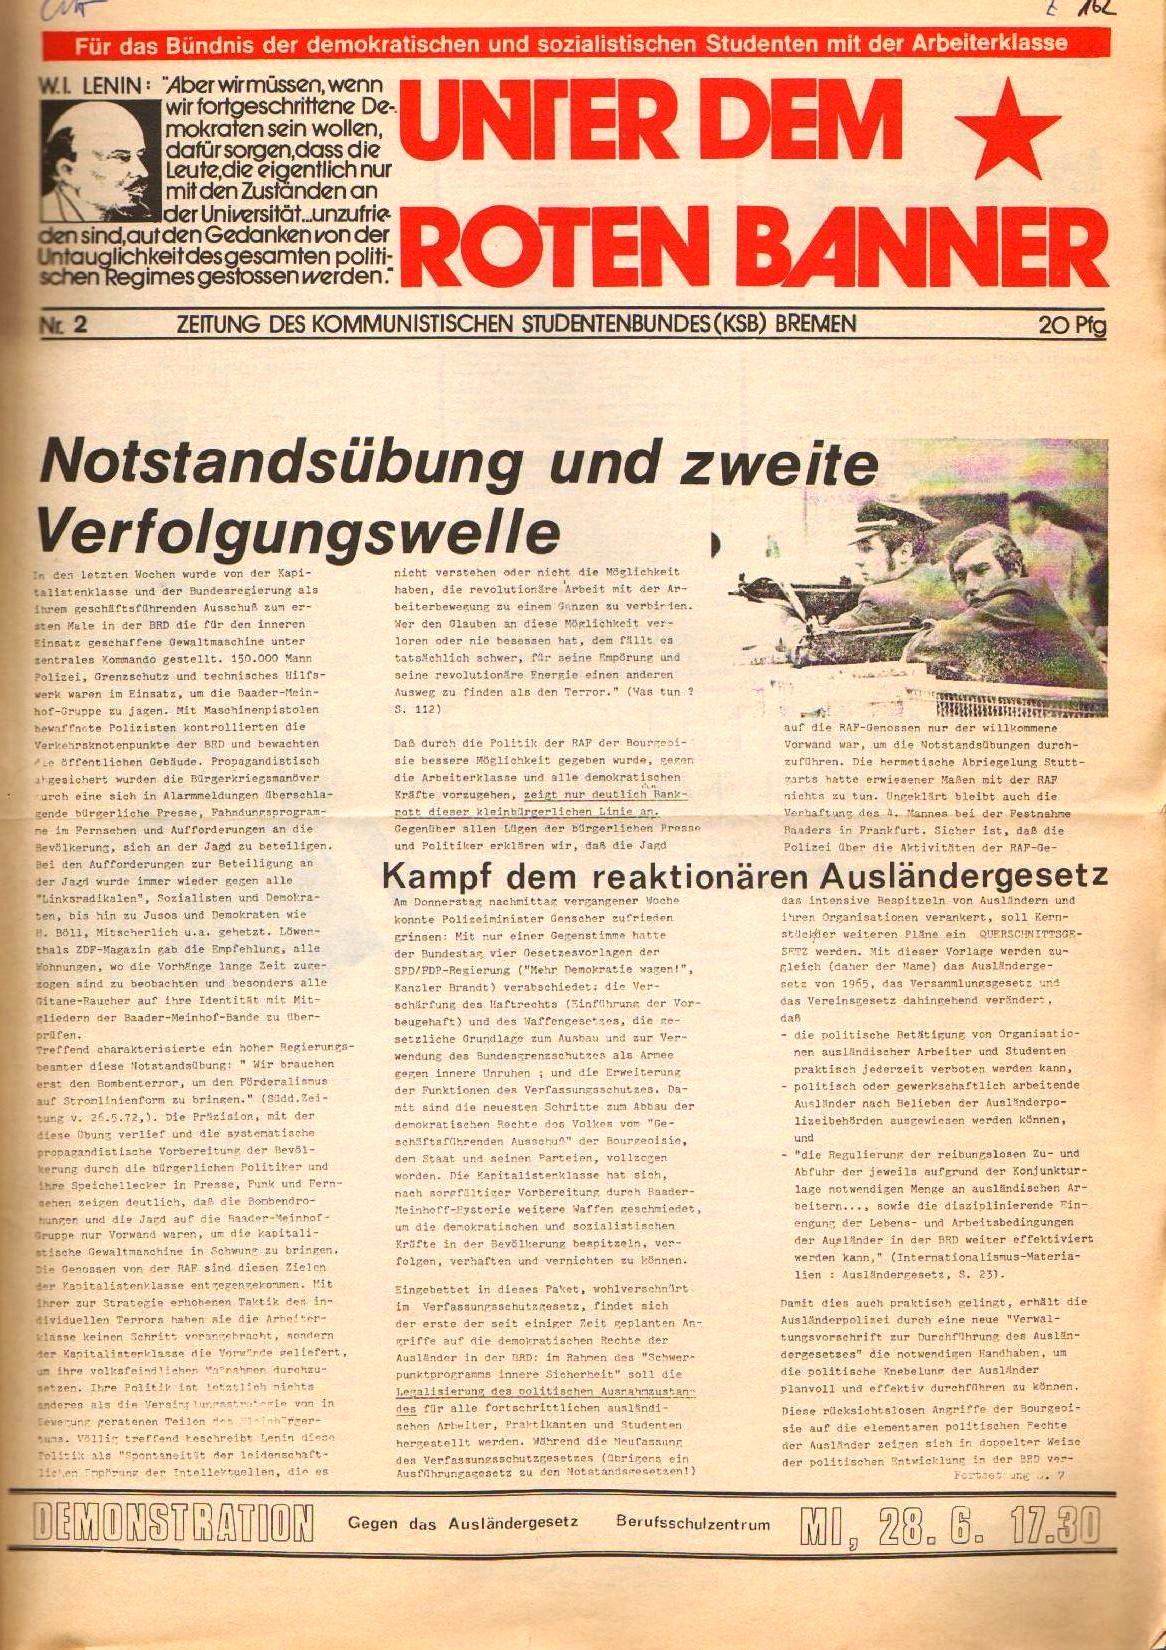 Bremen_Unter_dem_Roten_Banner009